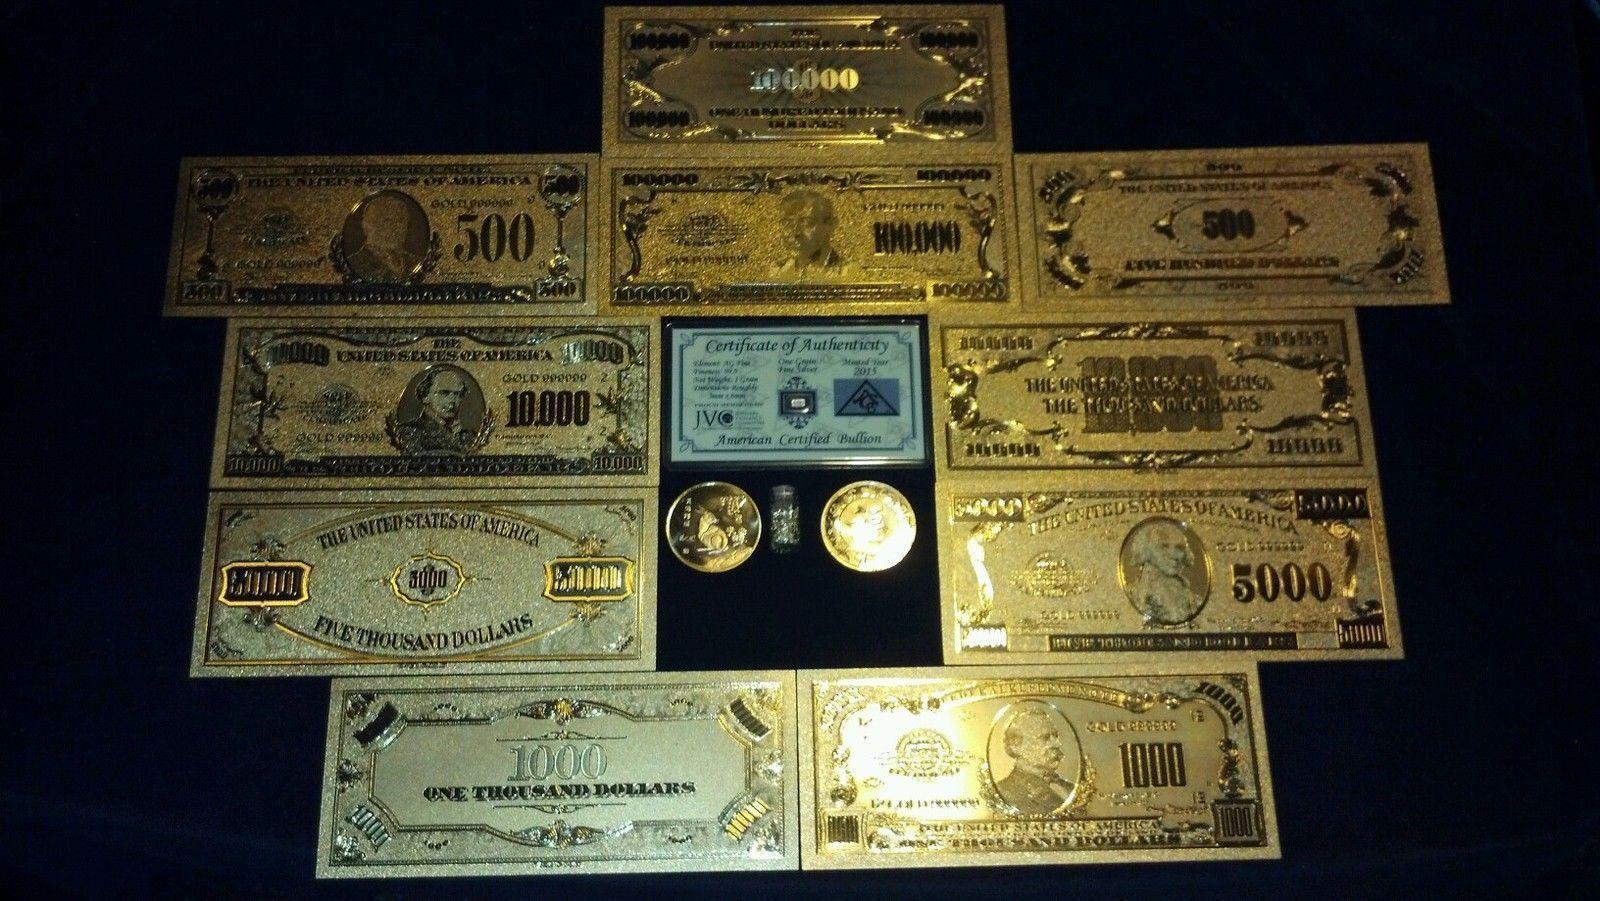 UNIQUE SET GOLD$500-100K COLLECTIBLE REP*BANKNOTES W/COA+COIN/FLAKE!FREE S&H - $28.08